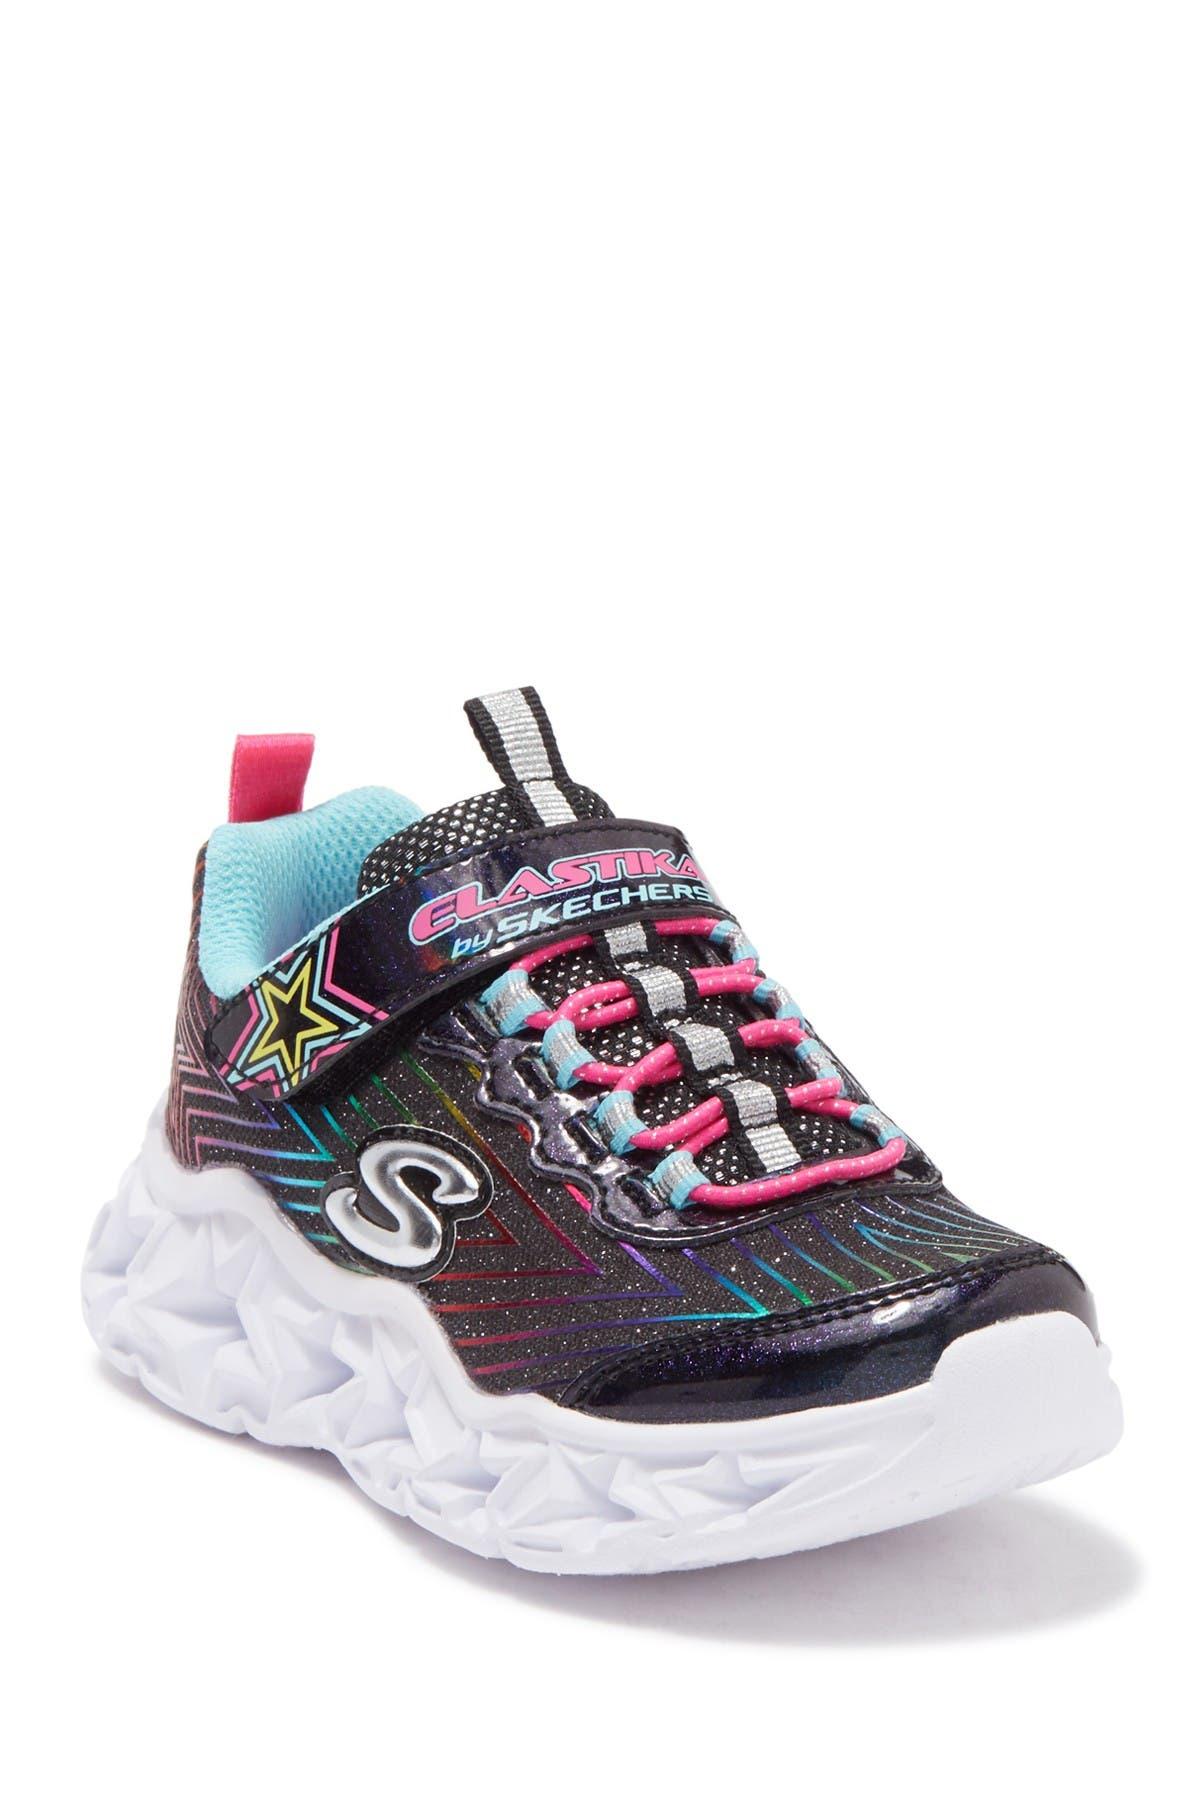 Image of Skechers Cosmic Charm Sneaker